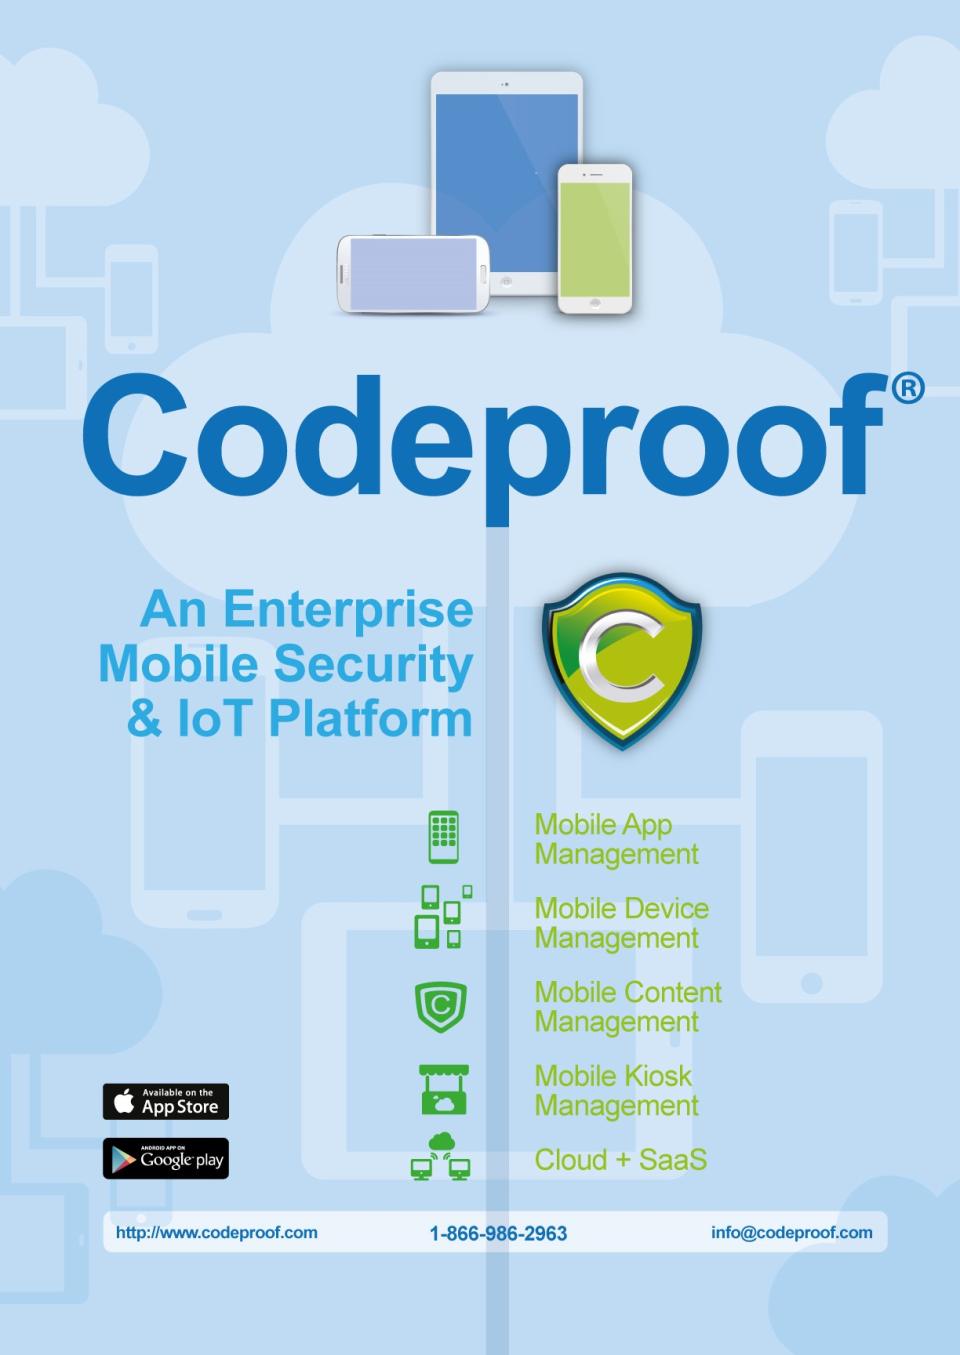 Codeproof Software - Codeproof flyer